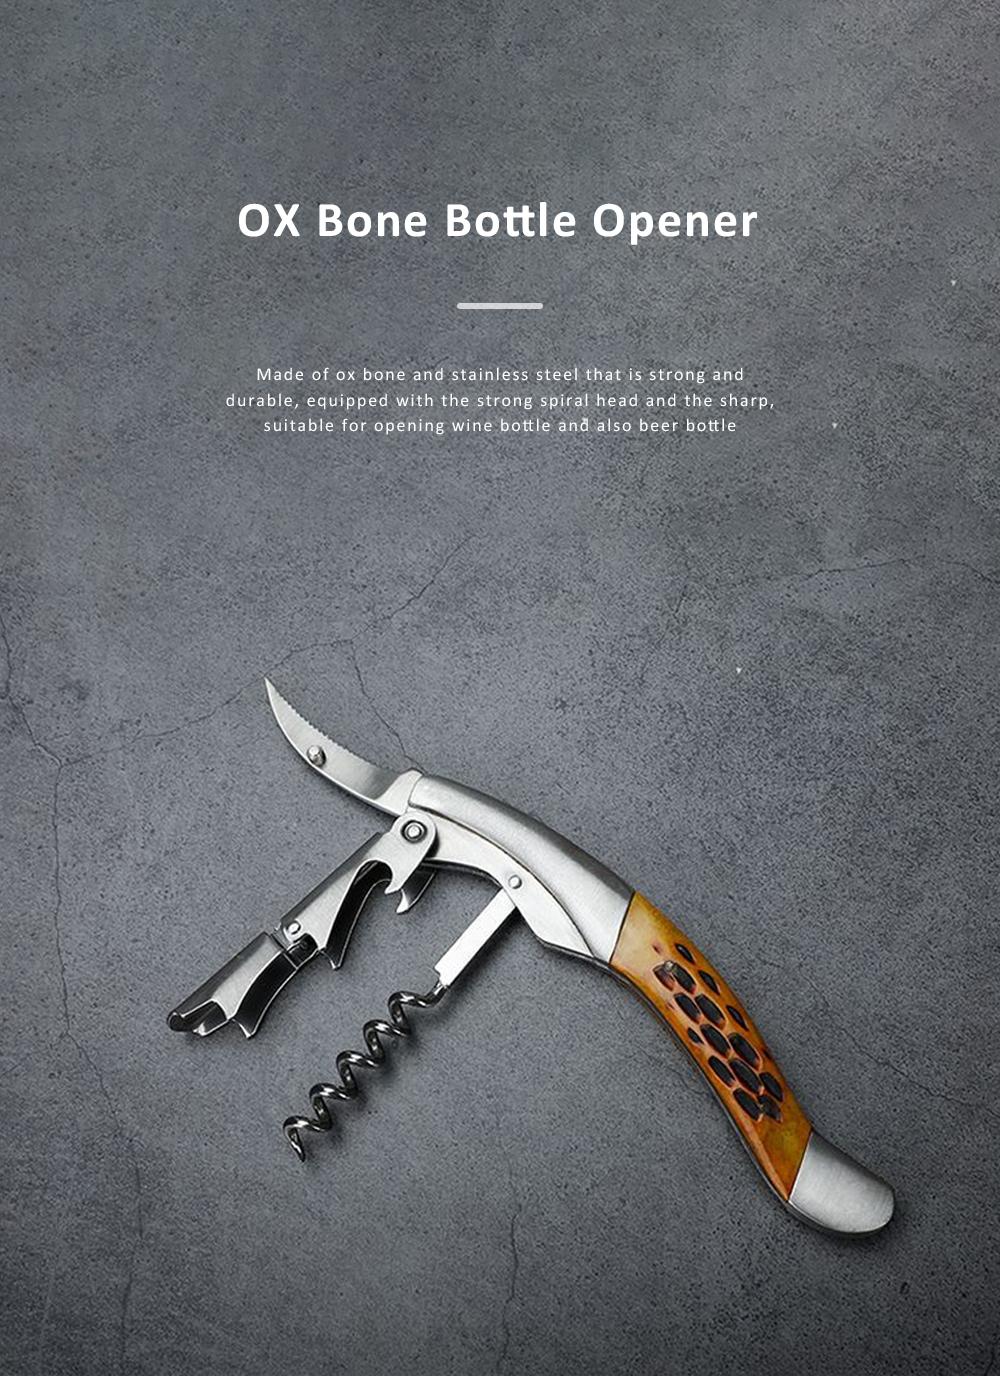 OX Bone Bottle Opener Stainless Steel Thickened Wine Bottle Opener with Little Knife 0